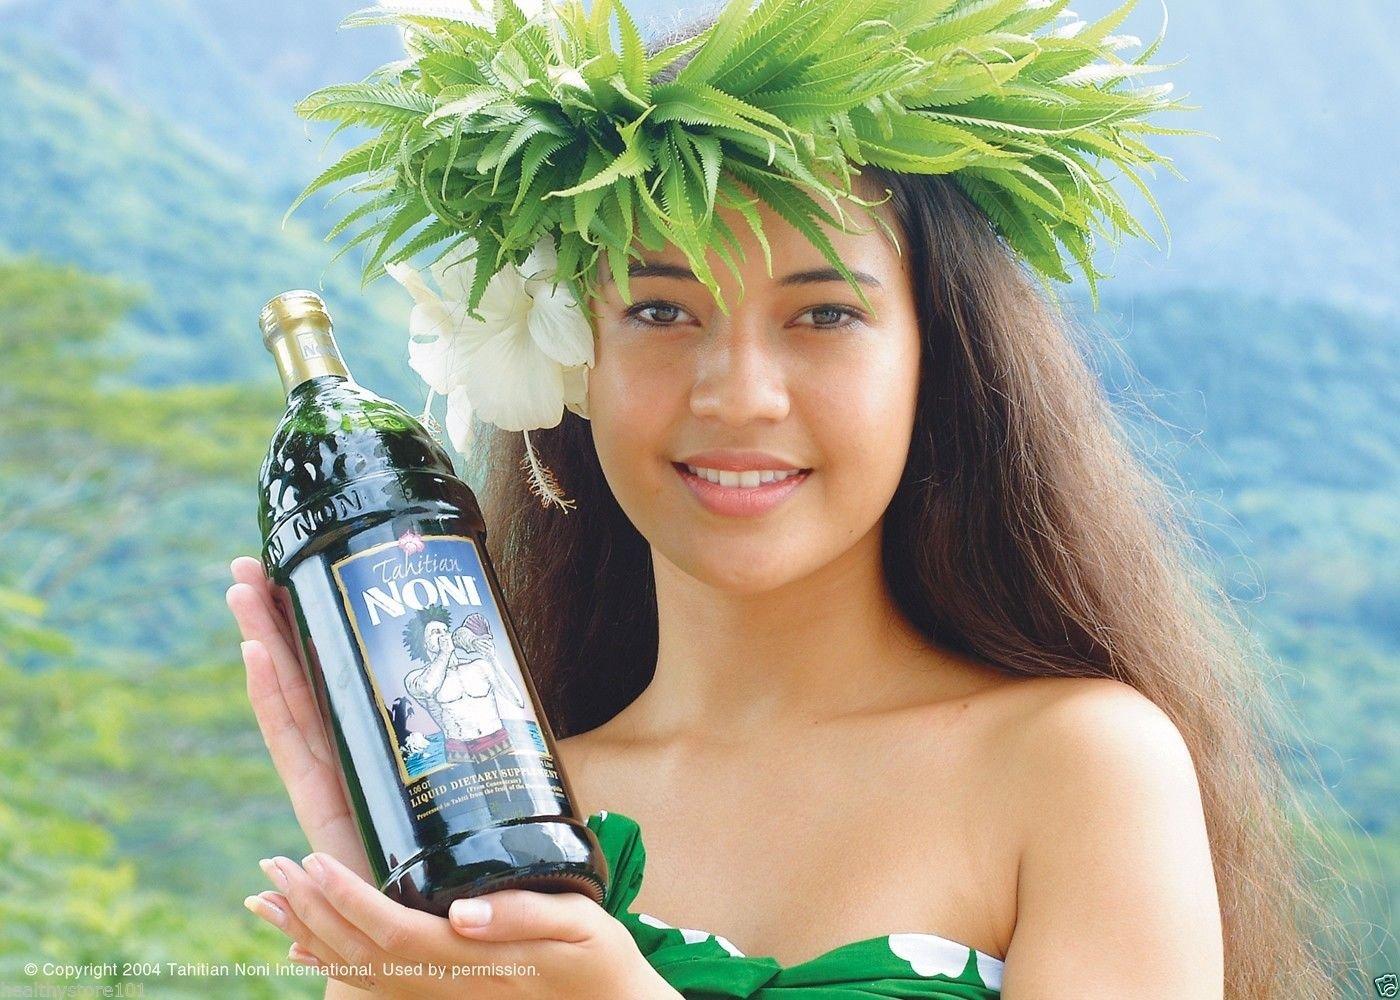 TAHITIAN NONI Juice by Morinda 2PK Case (Two 1 Liter Bottles per Case) by Tahitian Noni (Image #3)